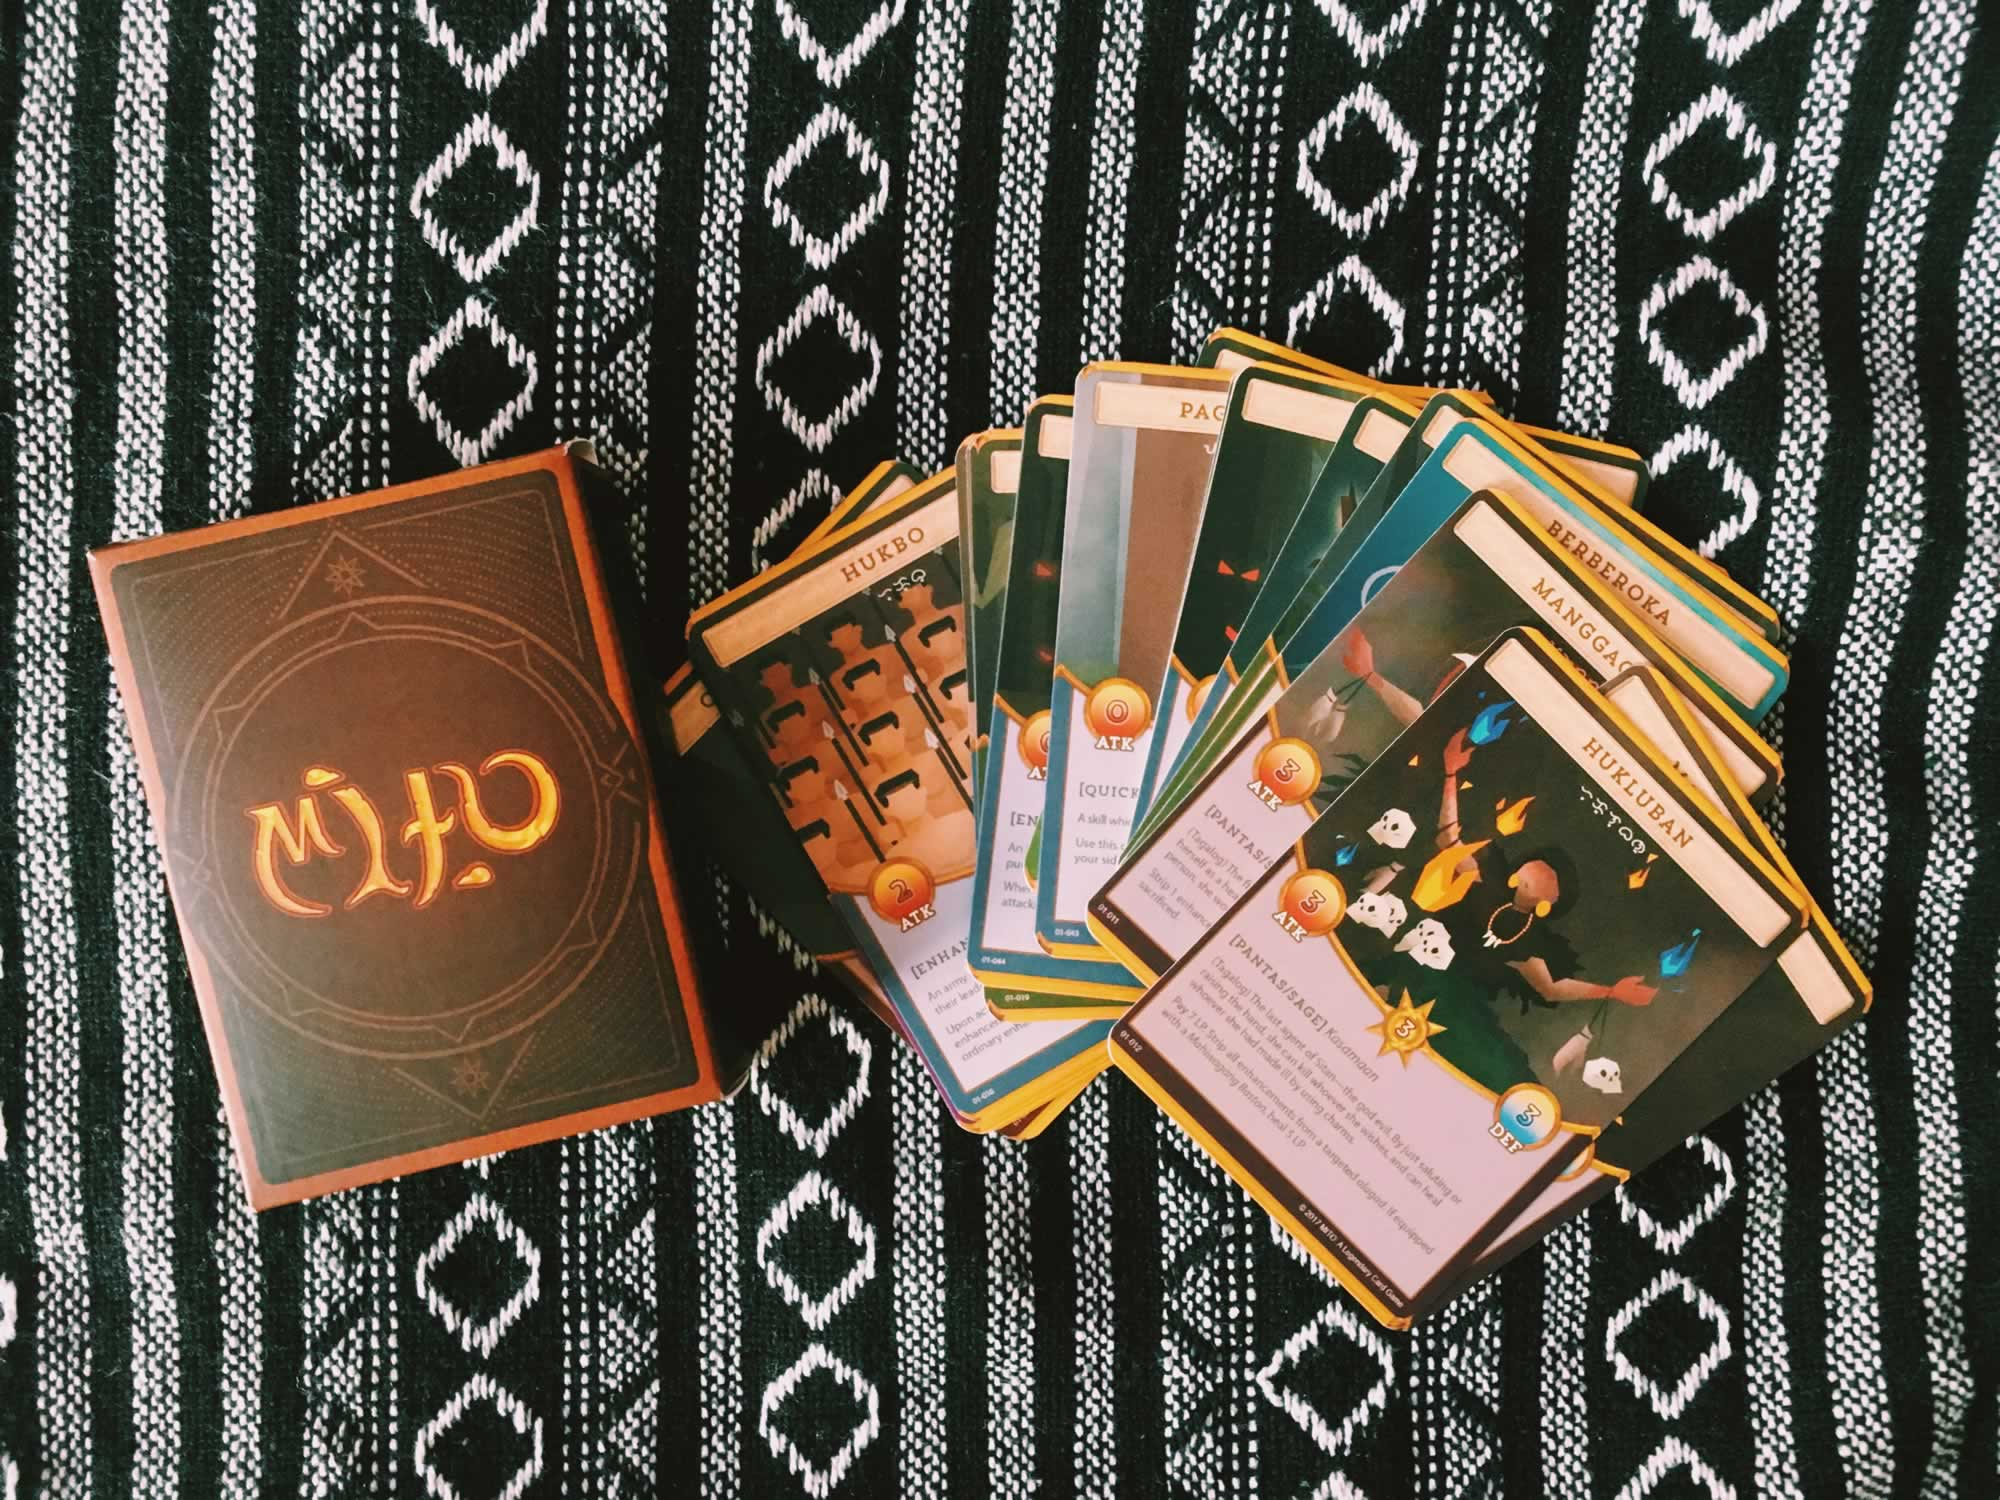 MITO_ A Legendary Card Game